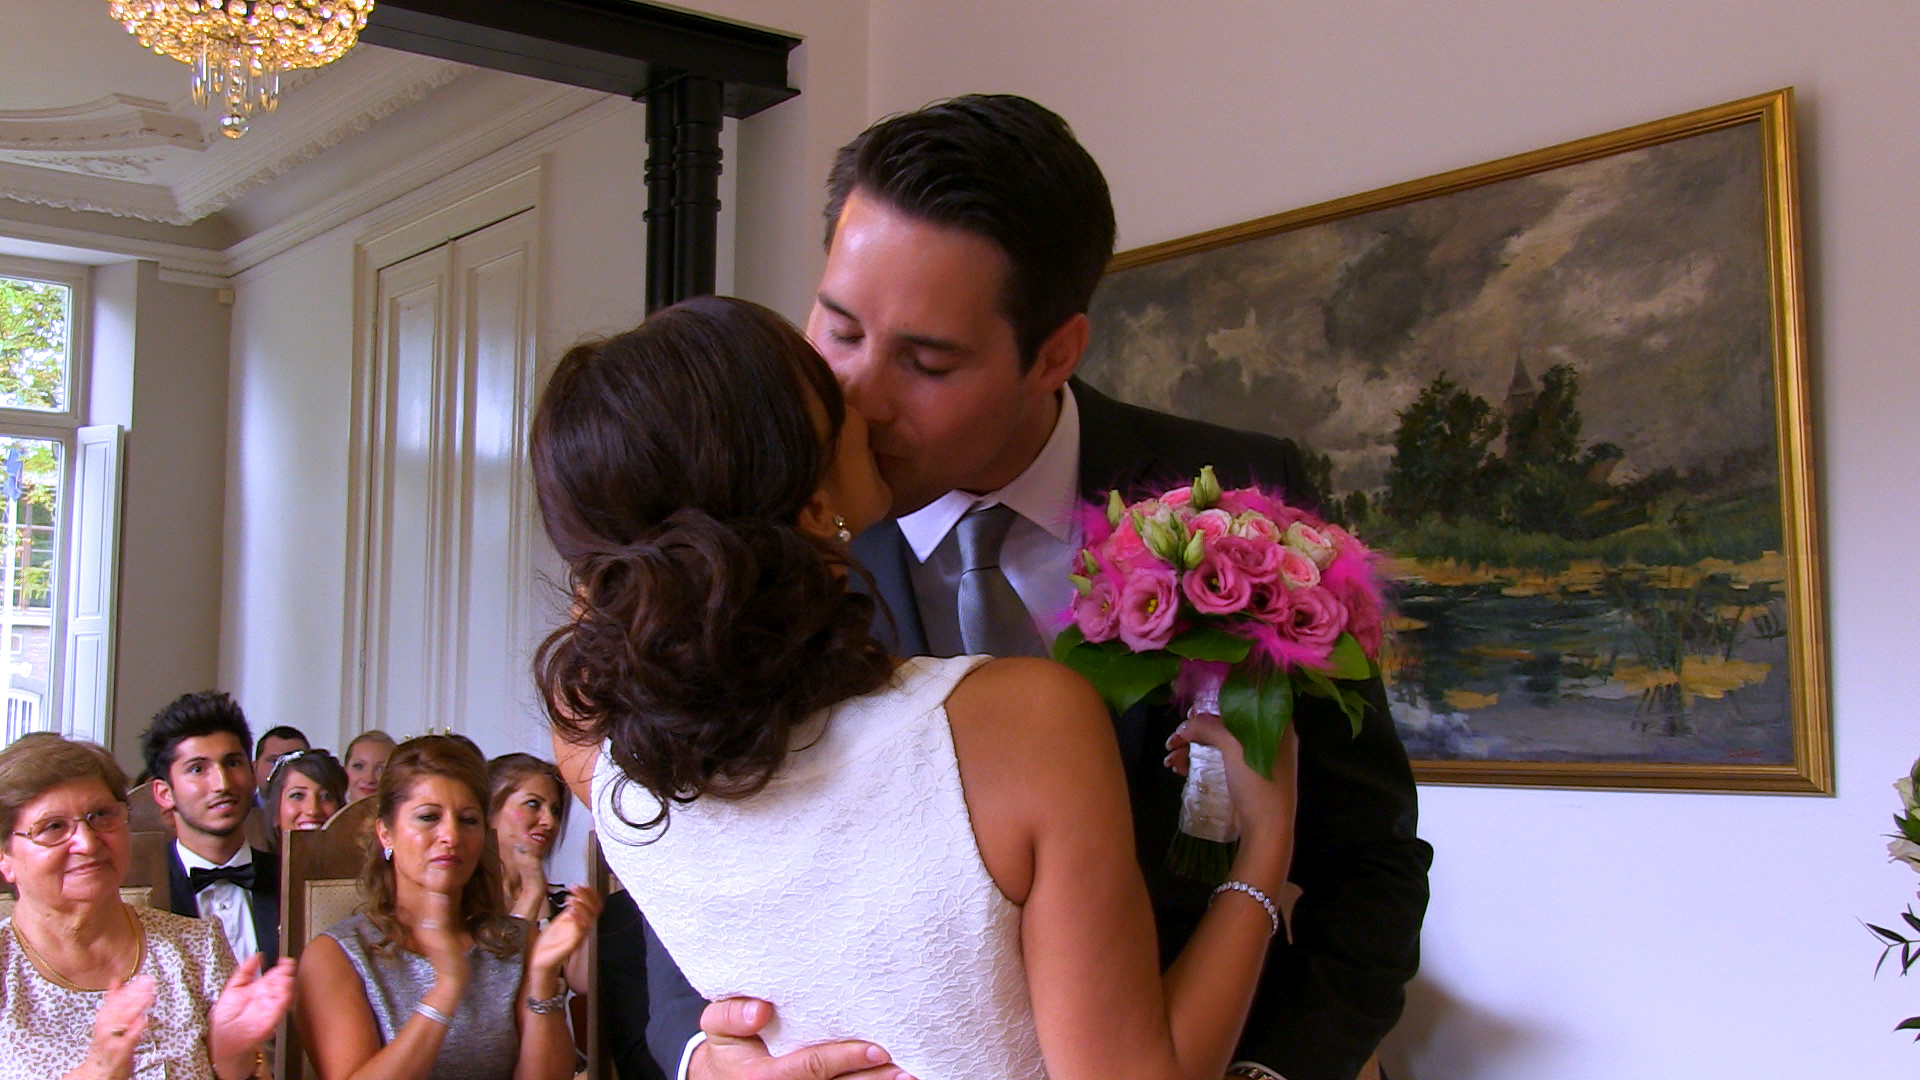 Your wedding film - Washington Square Films